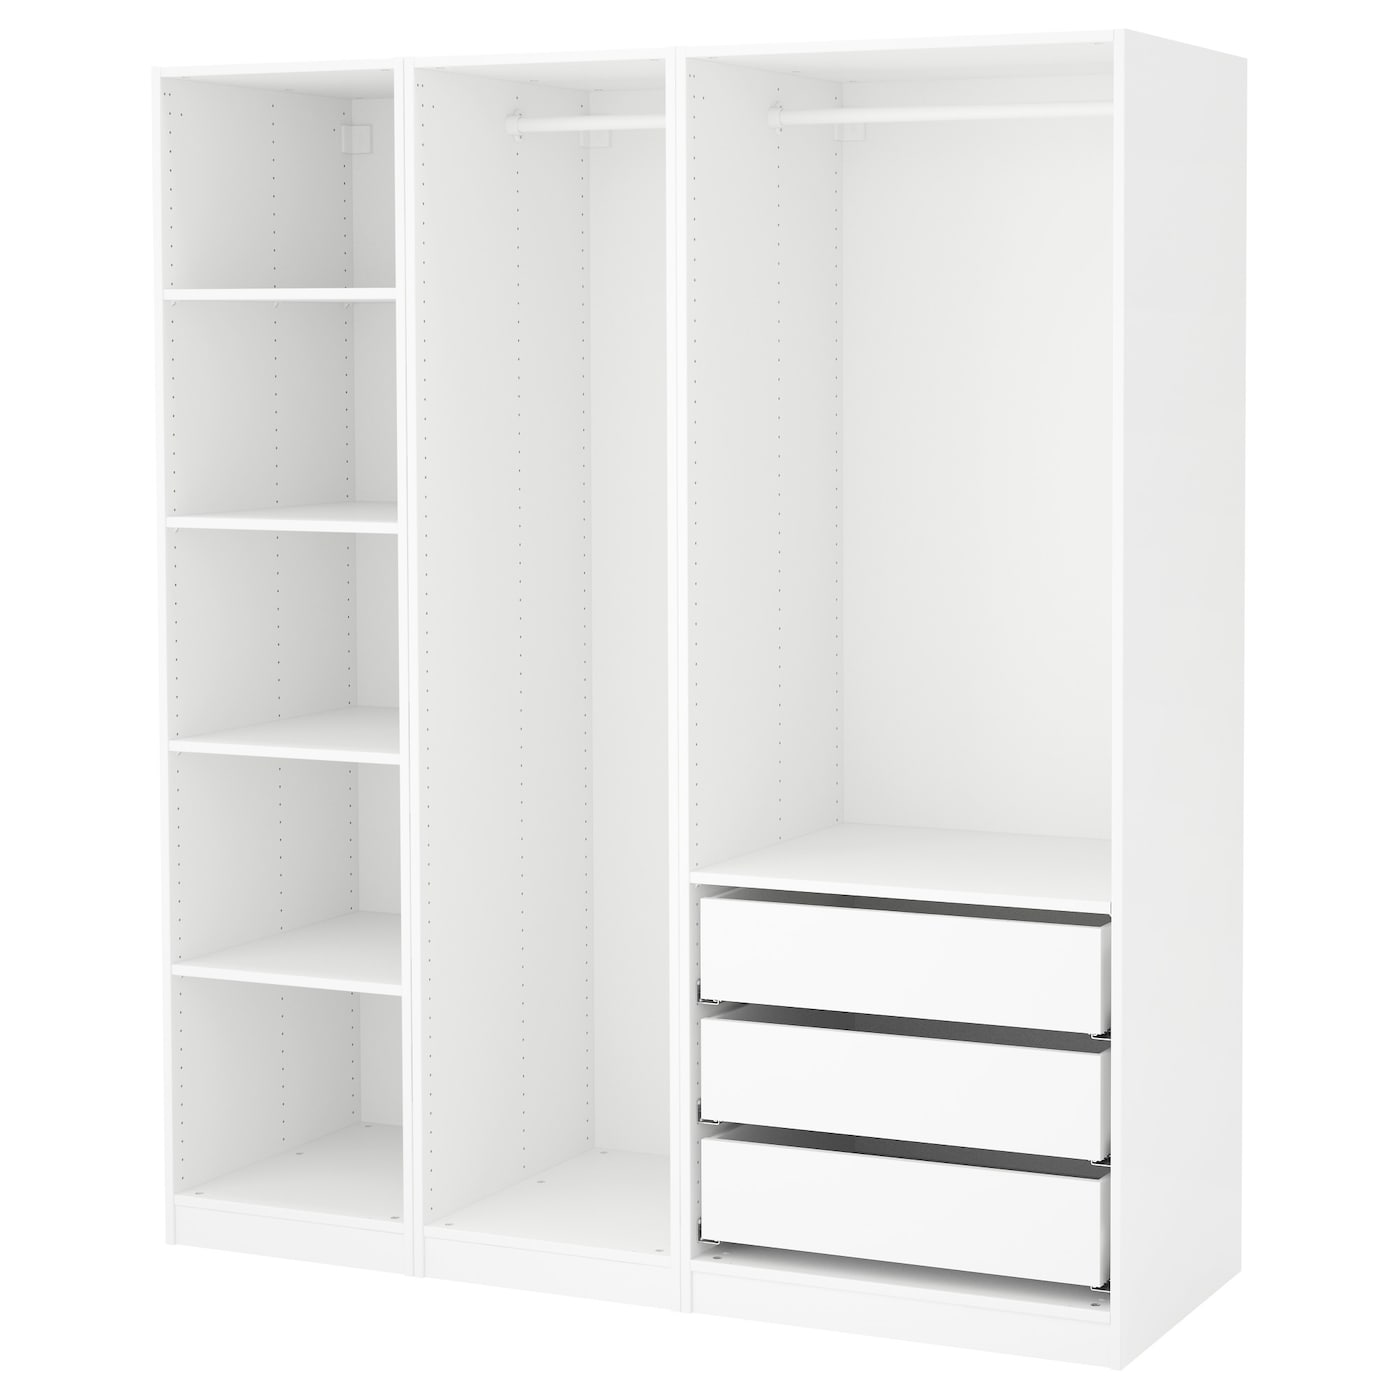 open wardrobes pax wardrobes at ikea ireland rh ikea com wardrobe with shelves only ikea wardrobe hanging shelves ikea